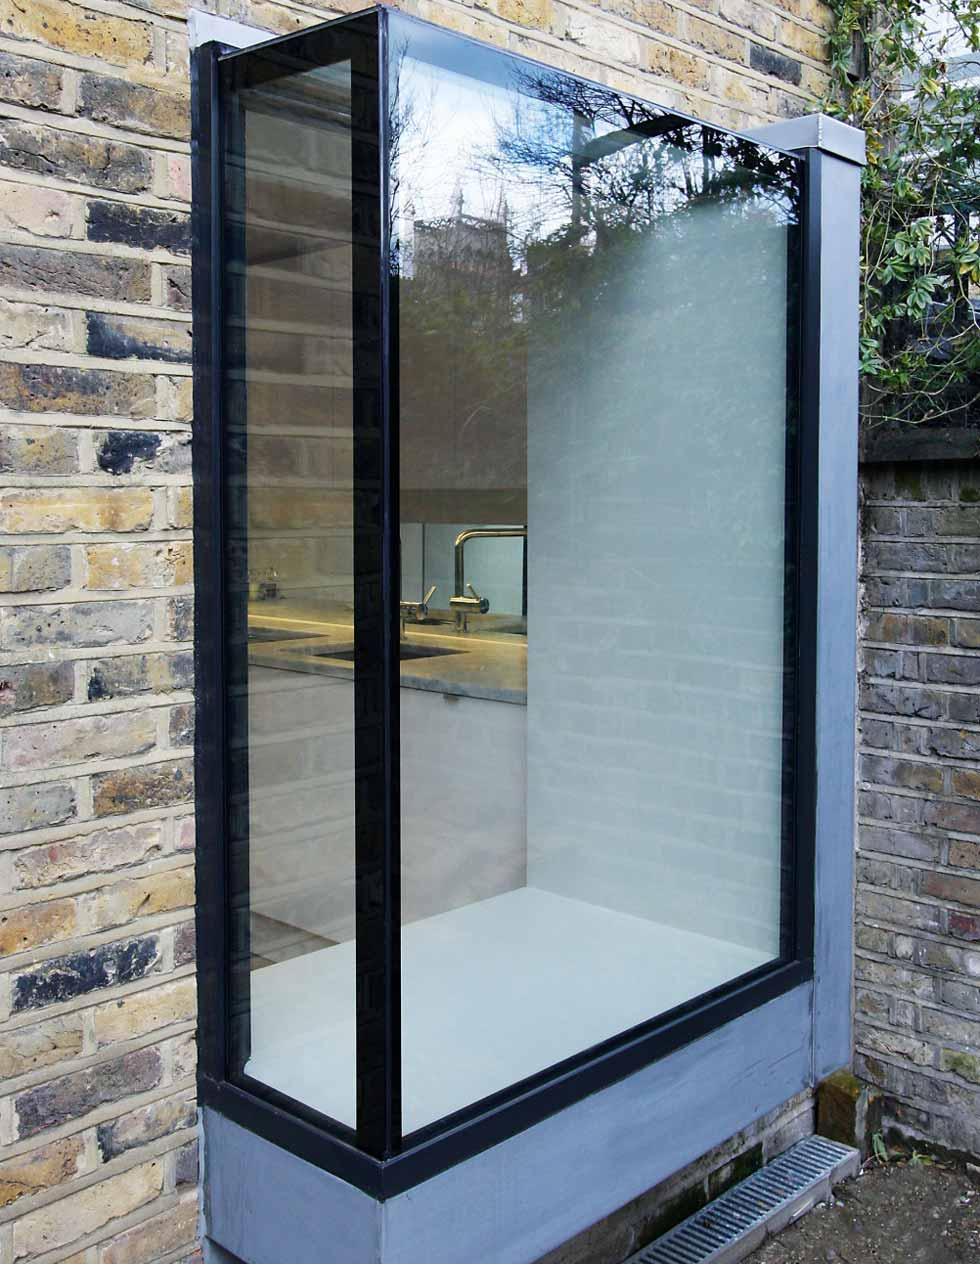 Box window design from IQ glass